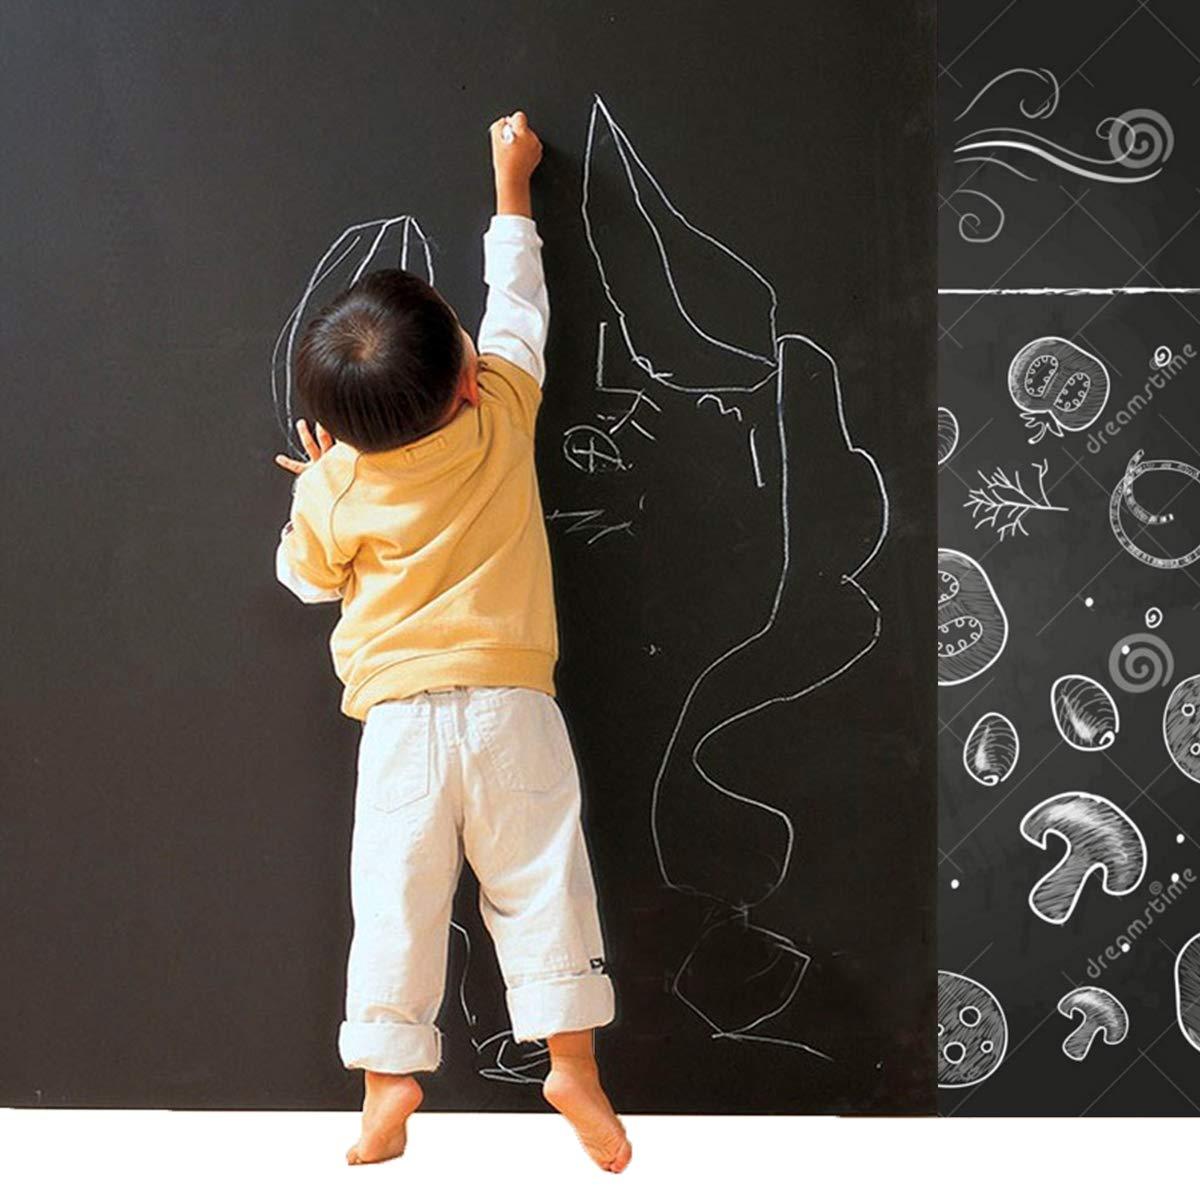 CUSFULL Self-Adhesive Blackboard Removable Chalkboard Wall Sticker for Home,Office & Decor 35.4'' x 78.7''-Black